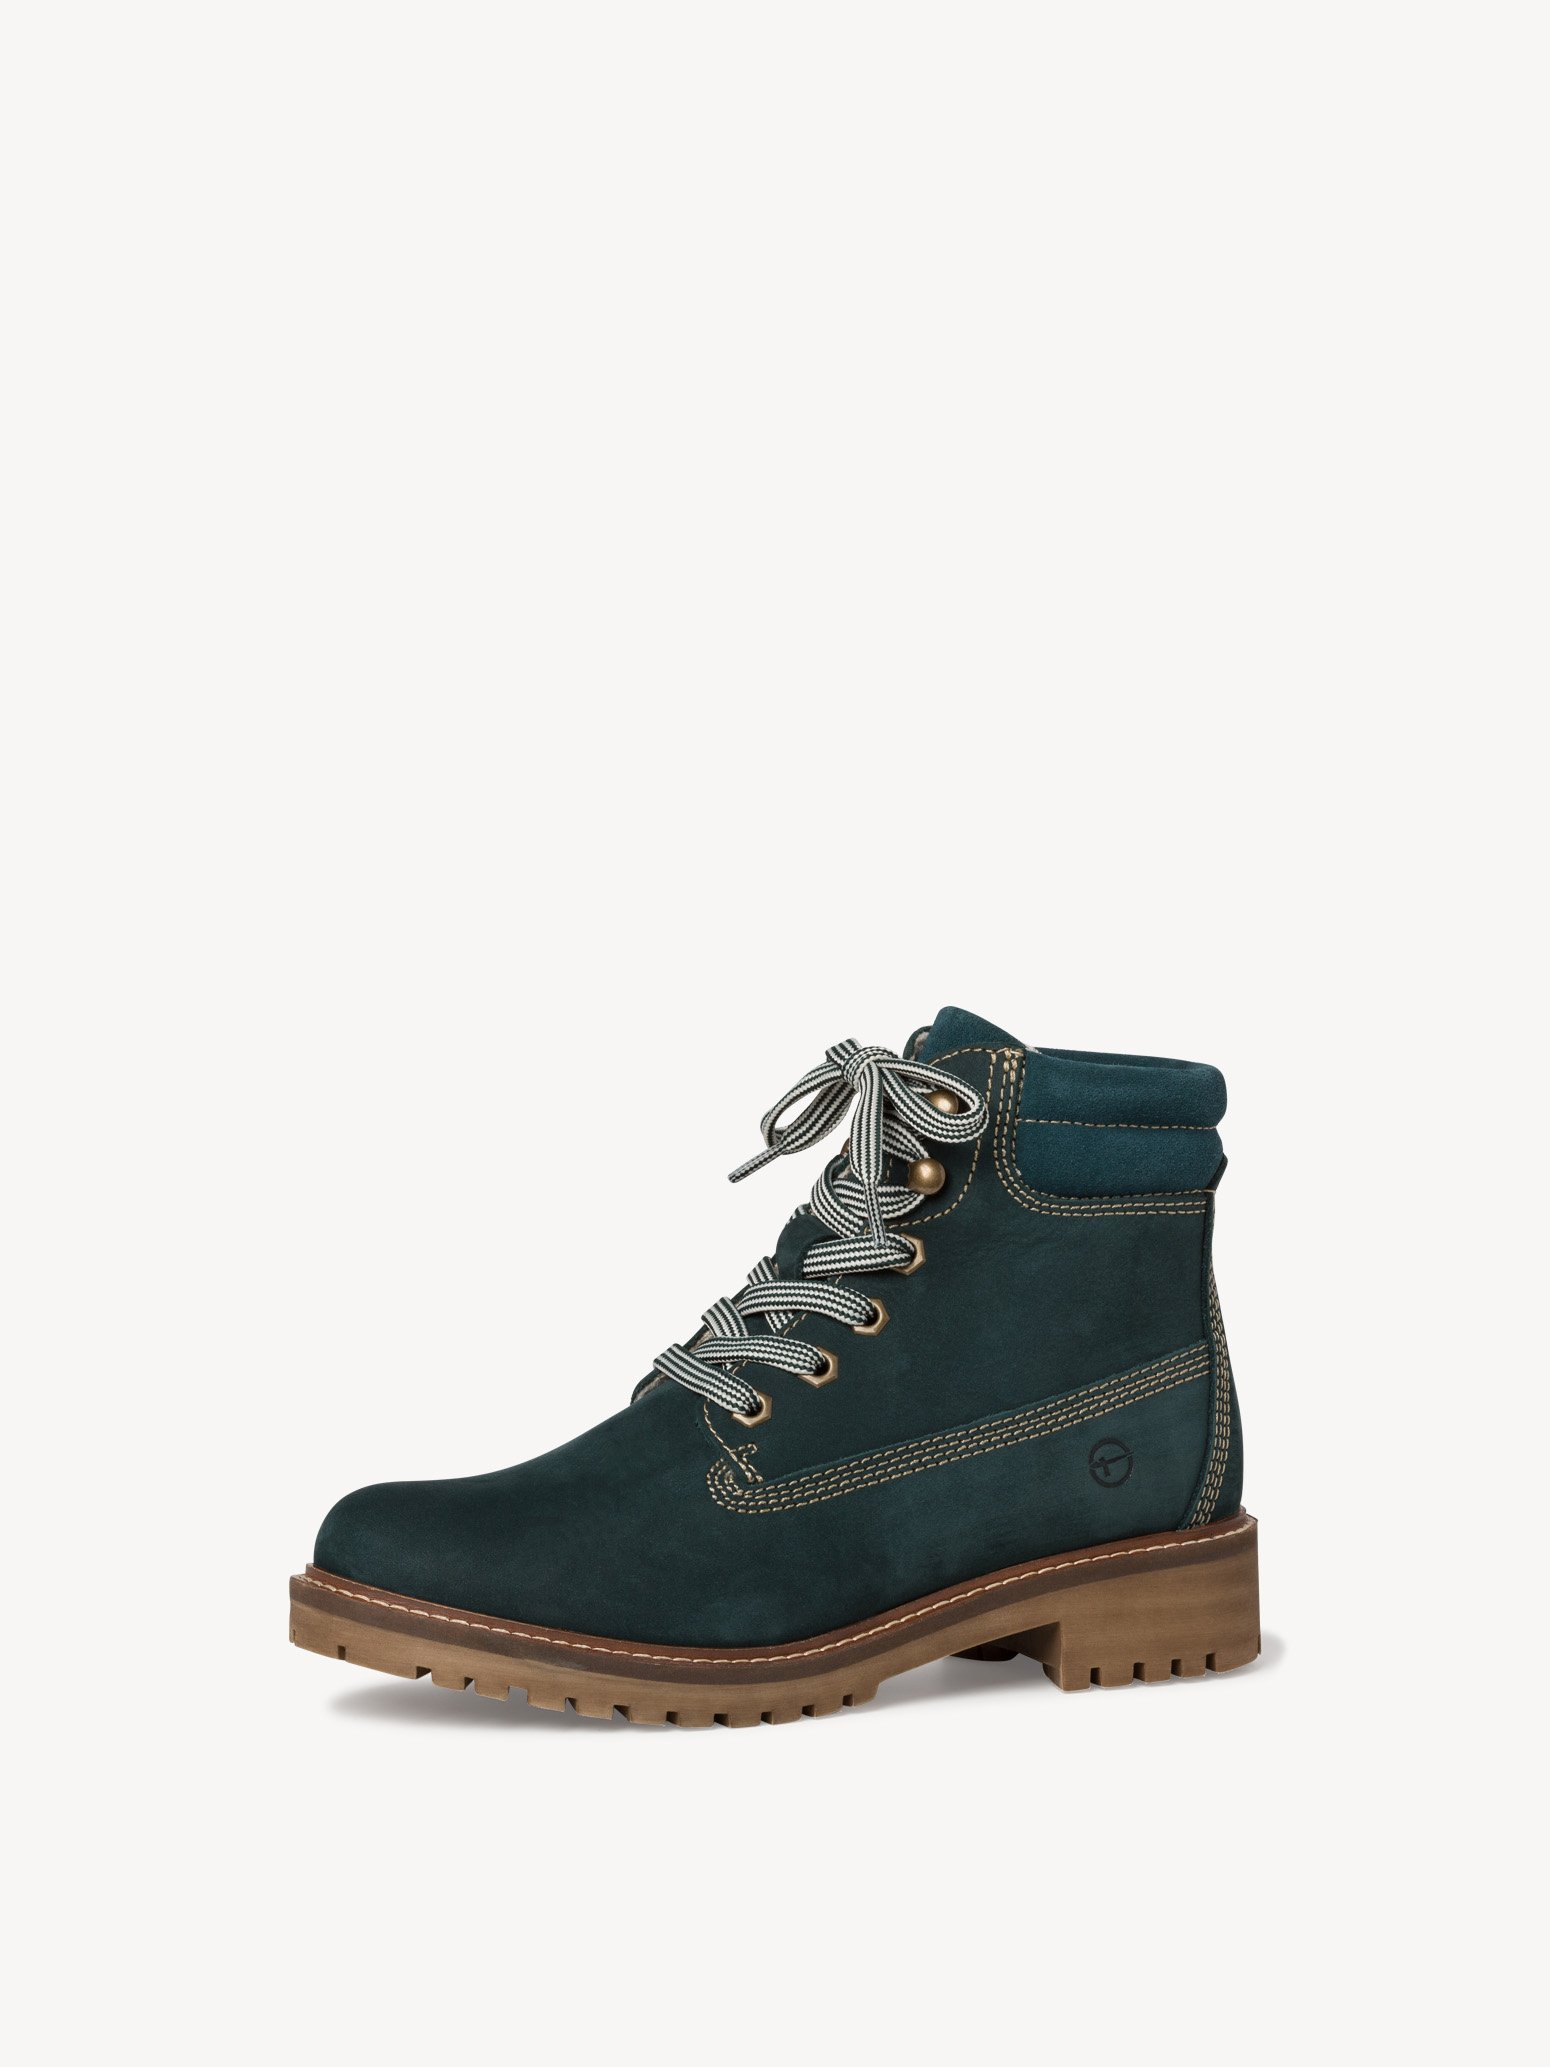 Ботинки Tamaris 1-1-25242-25-789